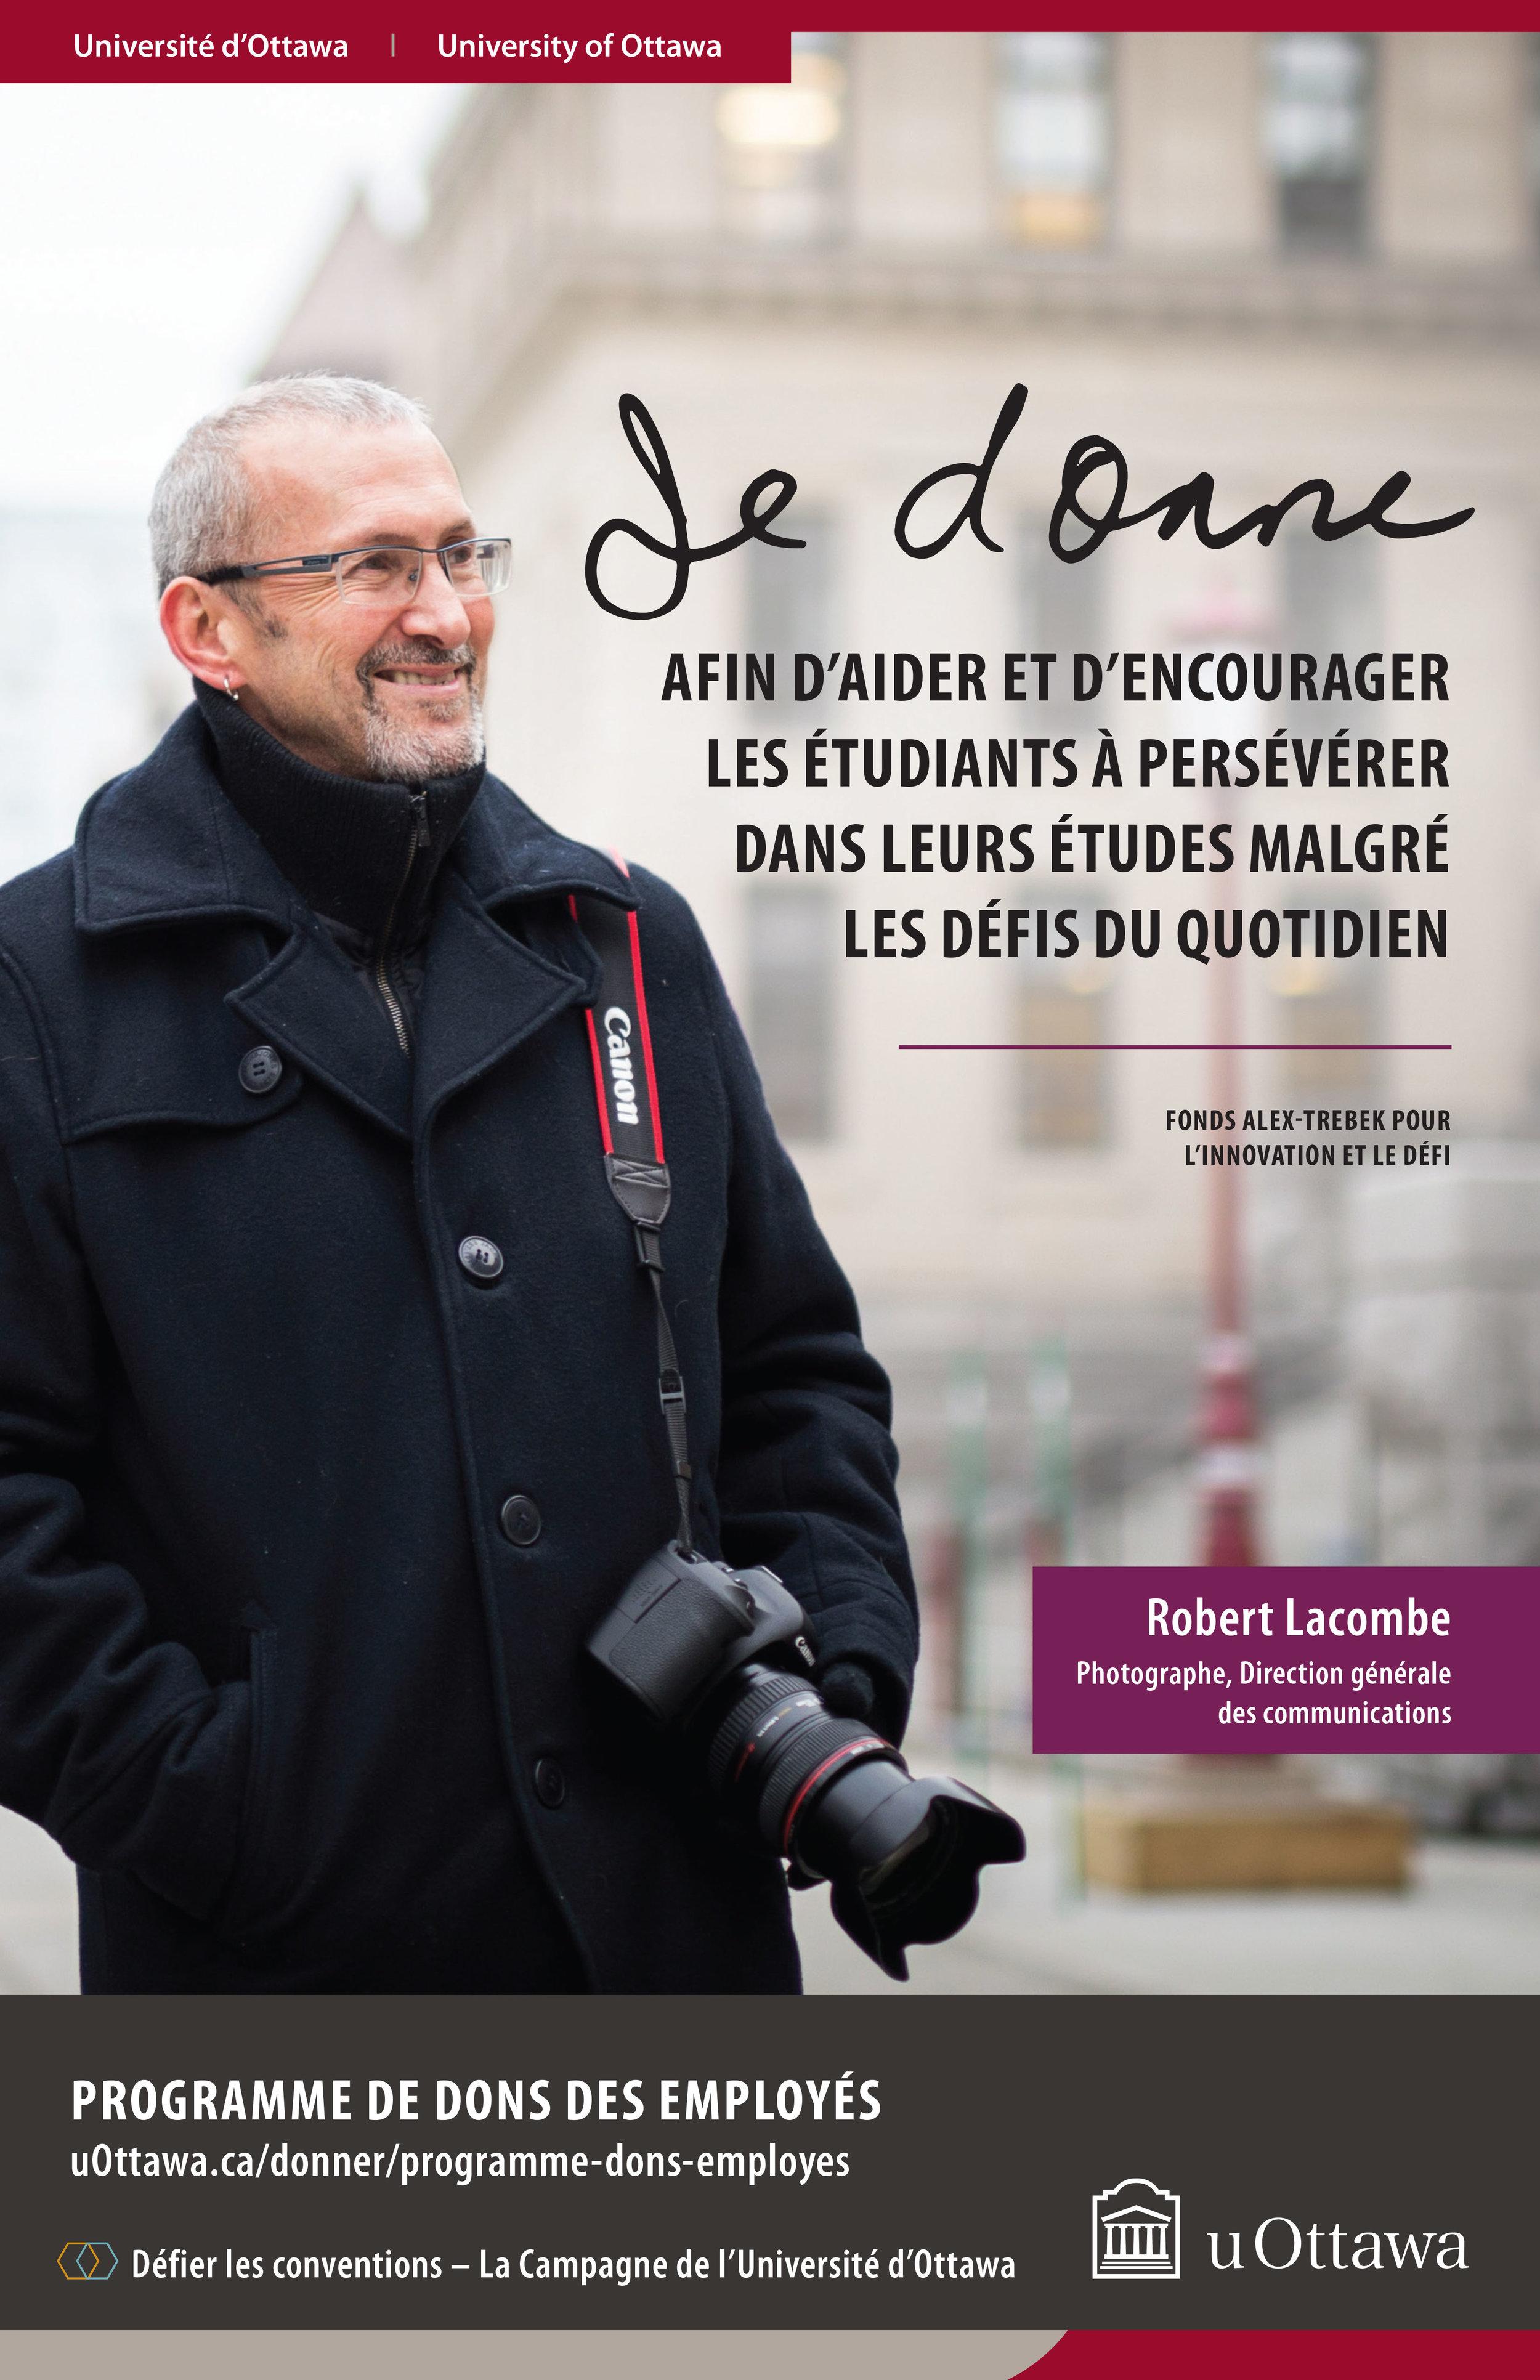 DEVT15_252_EmployeeGiving2016_Posters_FR_FINAL_PRINT_nocrop_Robert.jpg